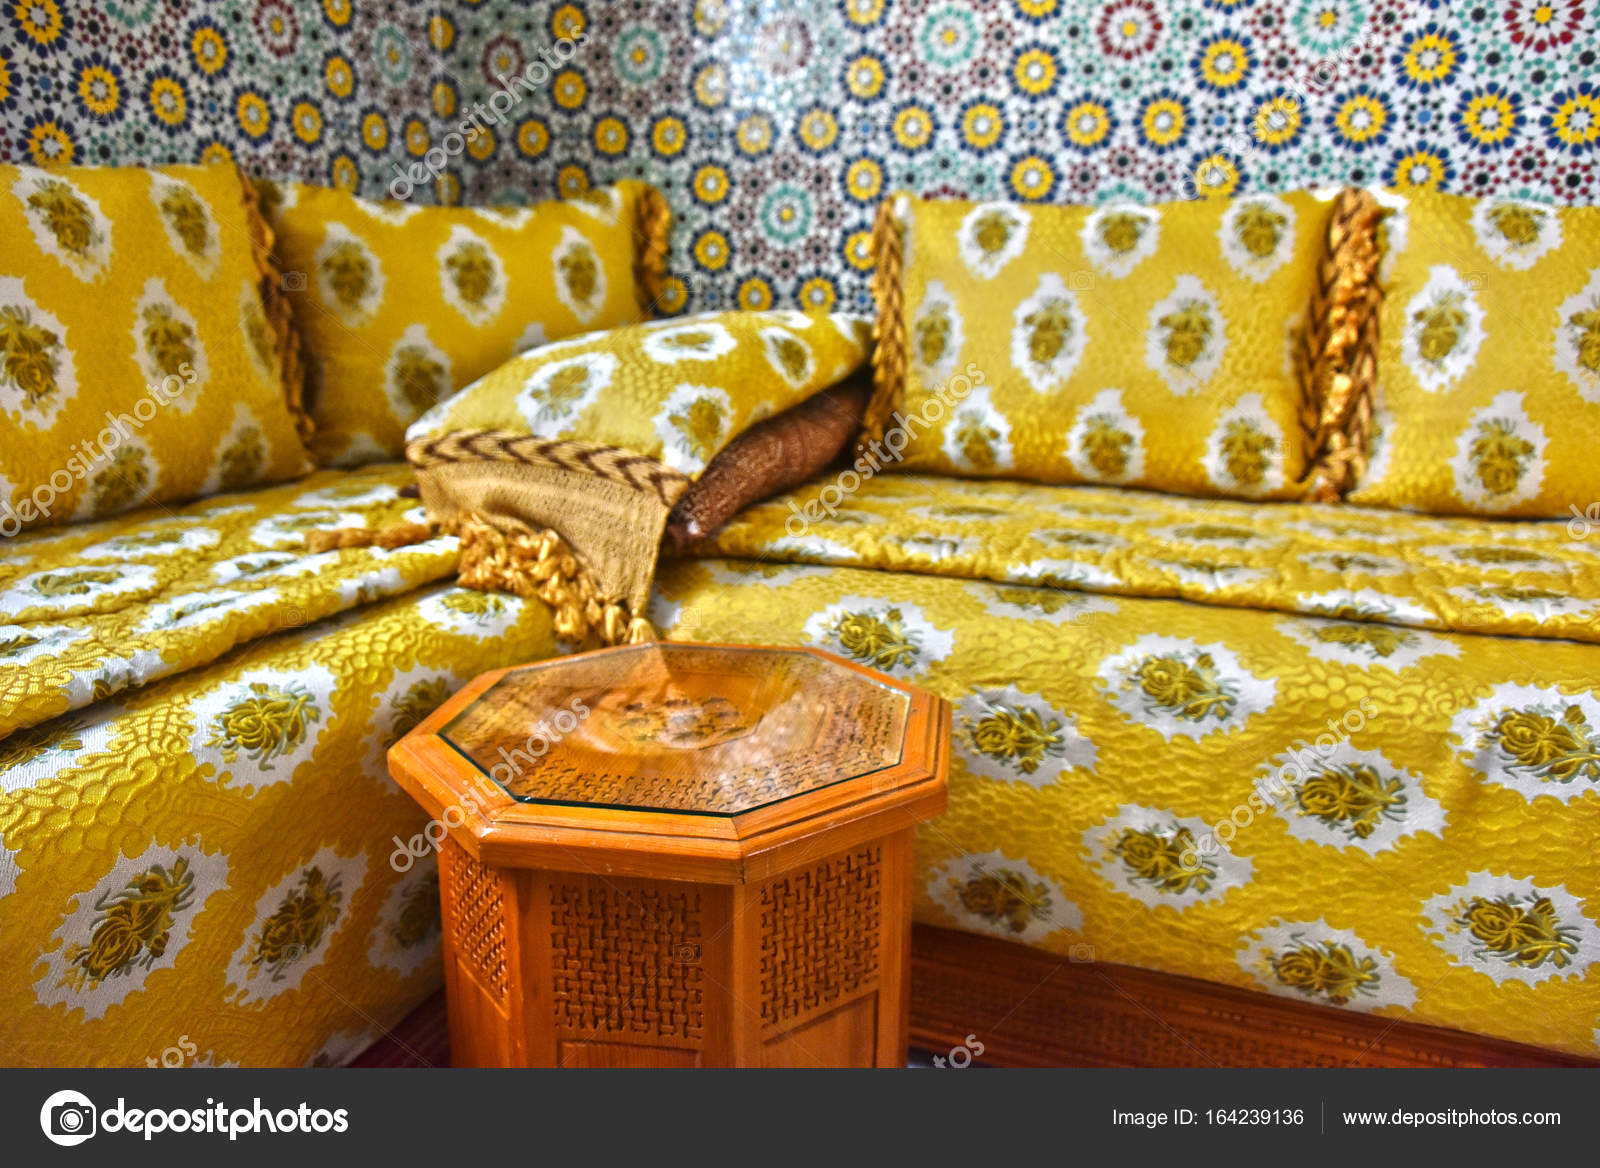 https://st3.depositphotos.com/1063437/16423/i/1600/depositphotos_164239136-stockafbeelding-traditionele-marokkaanse-interieur.jpg